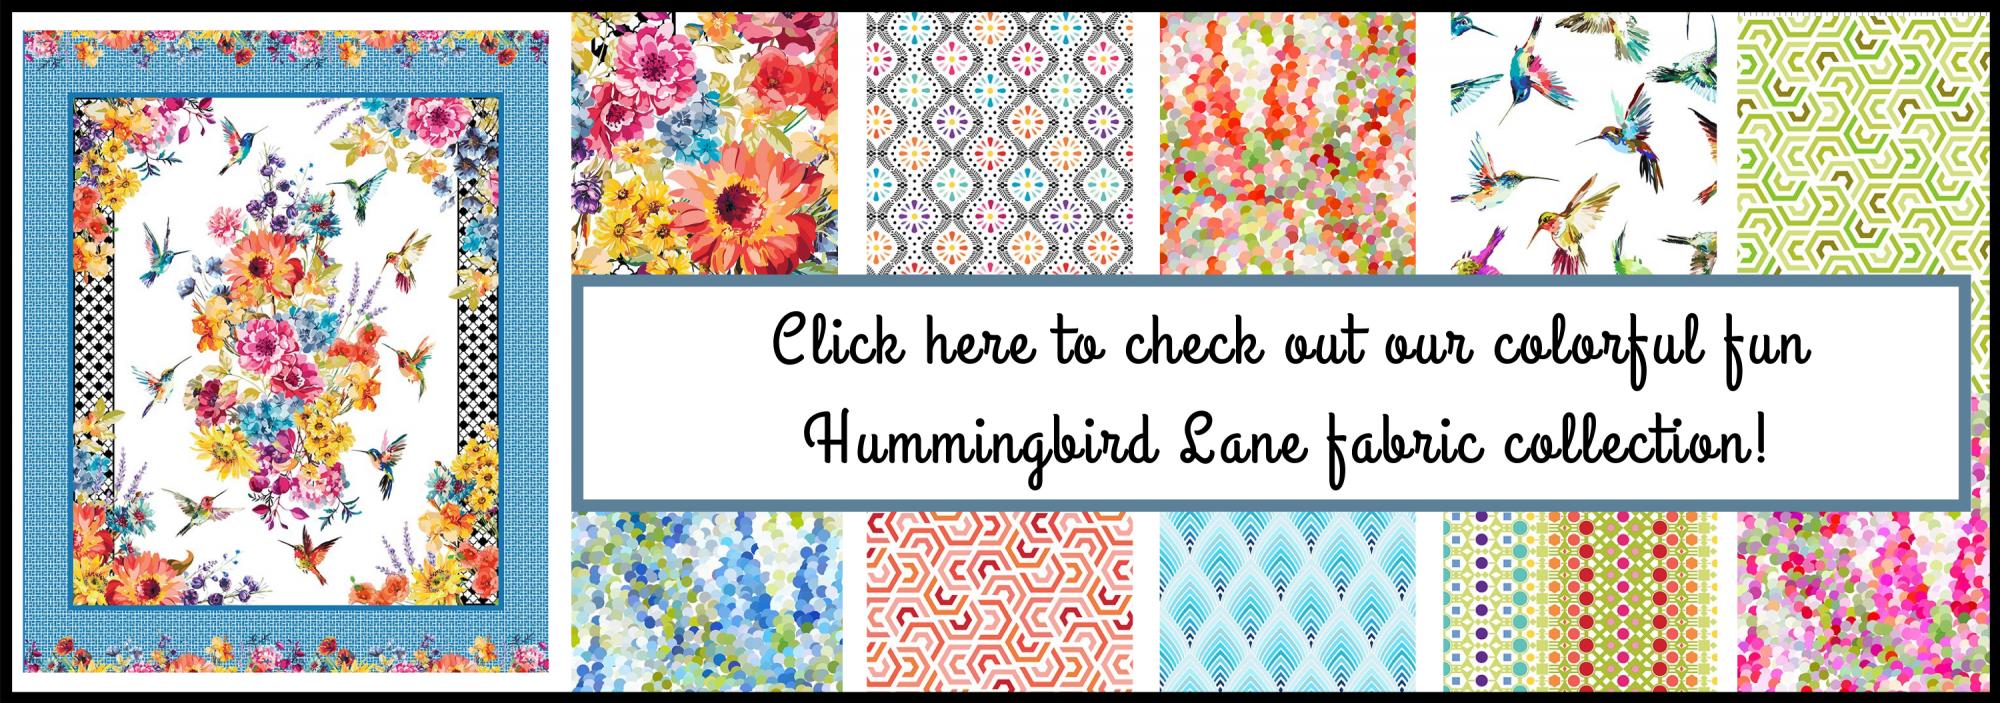 bee's quilt shop st augustine in the beginning fabrics hummingbird lane